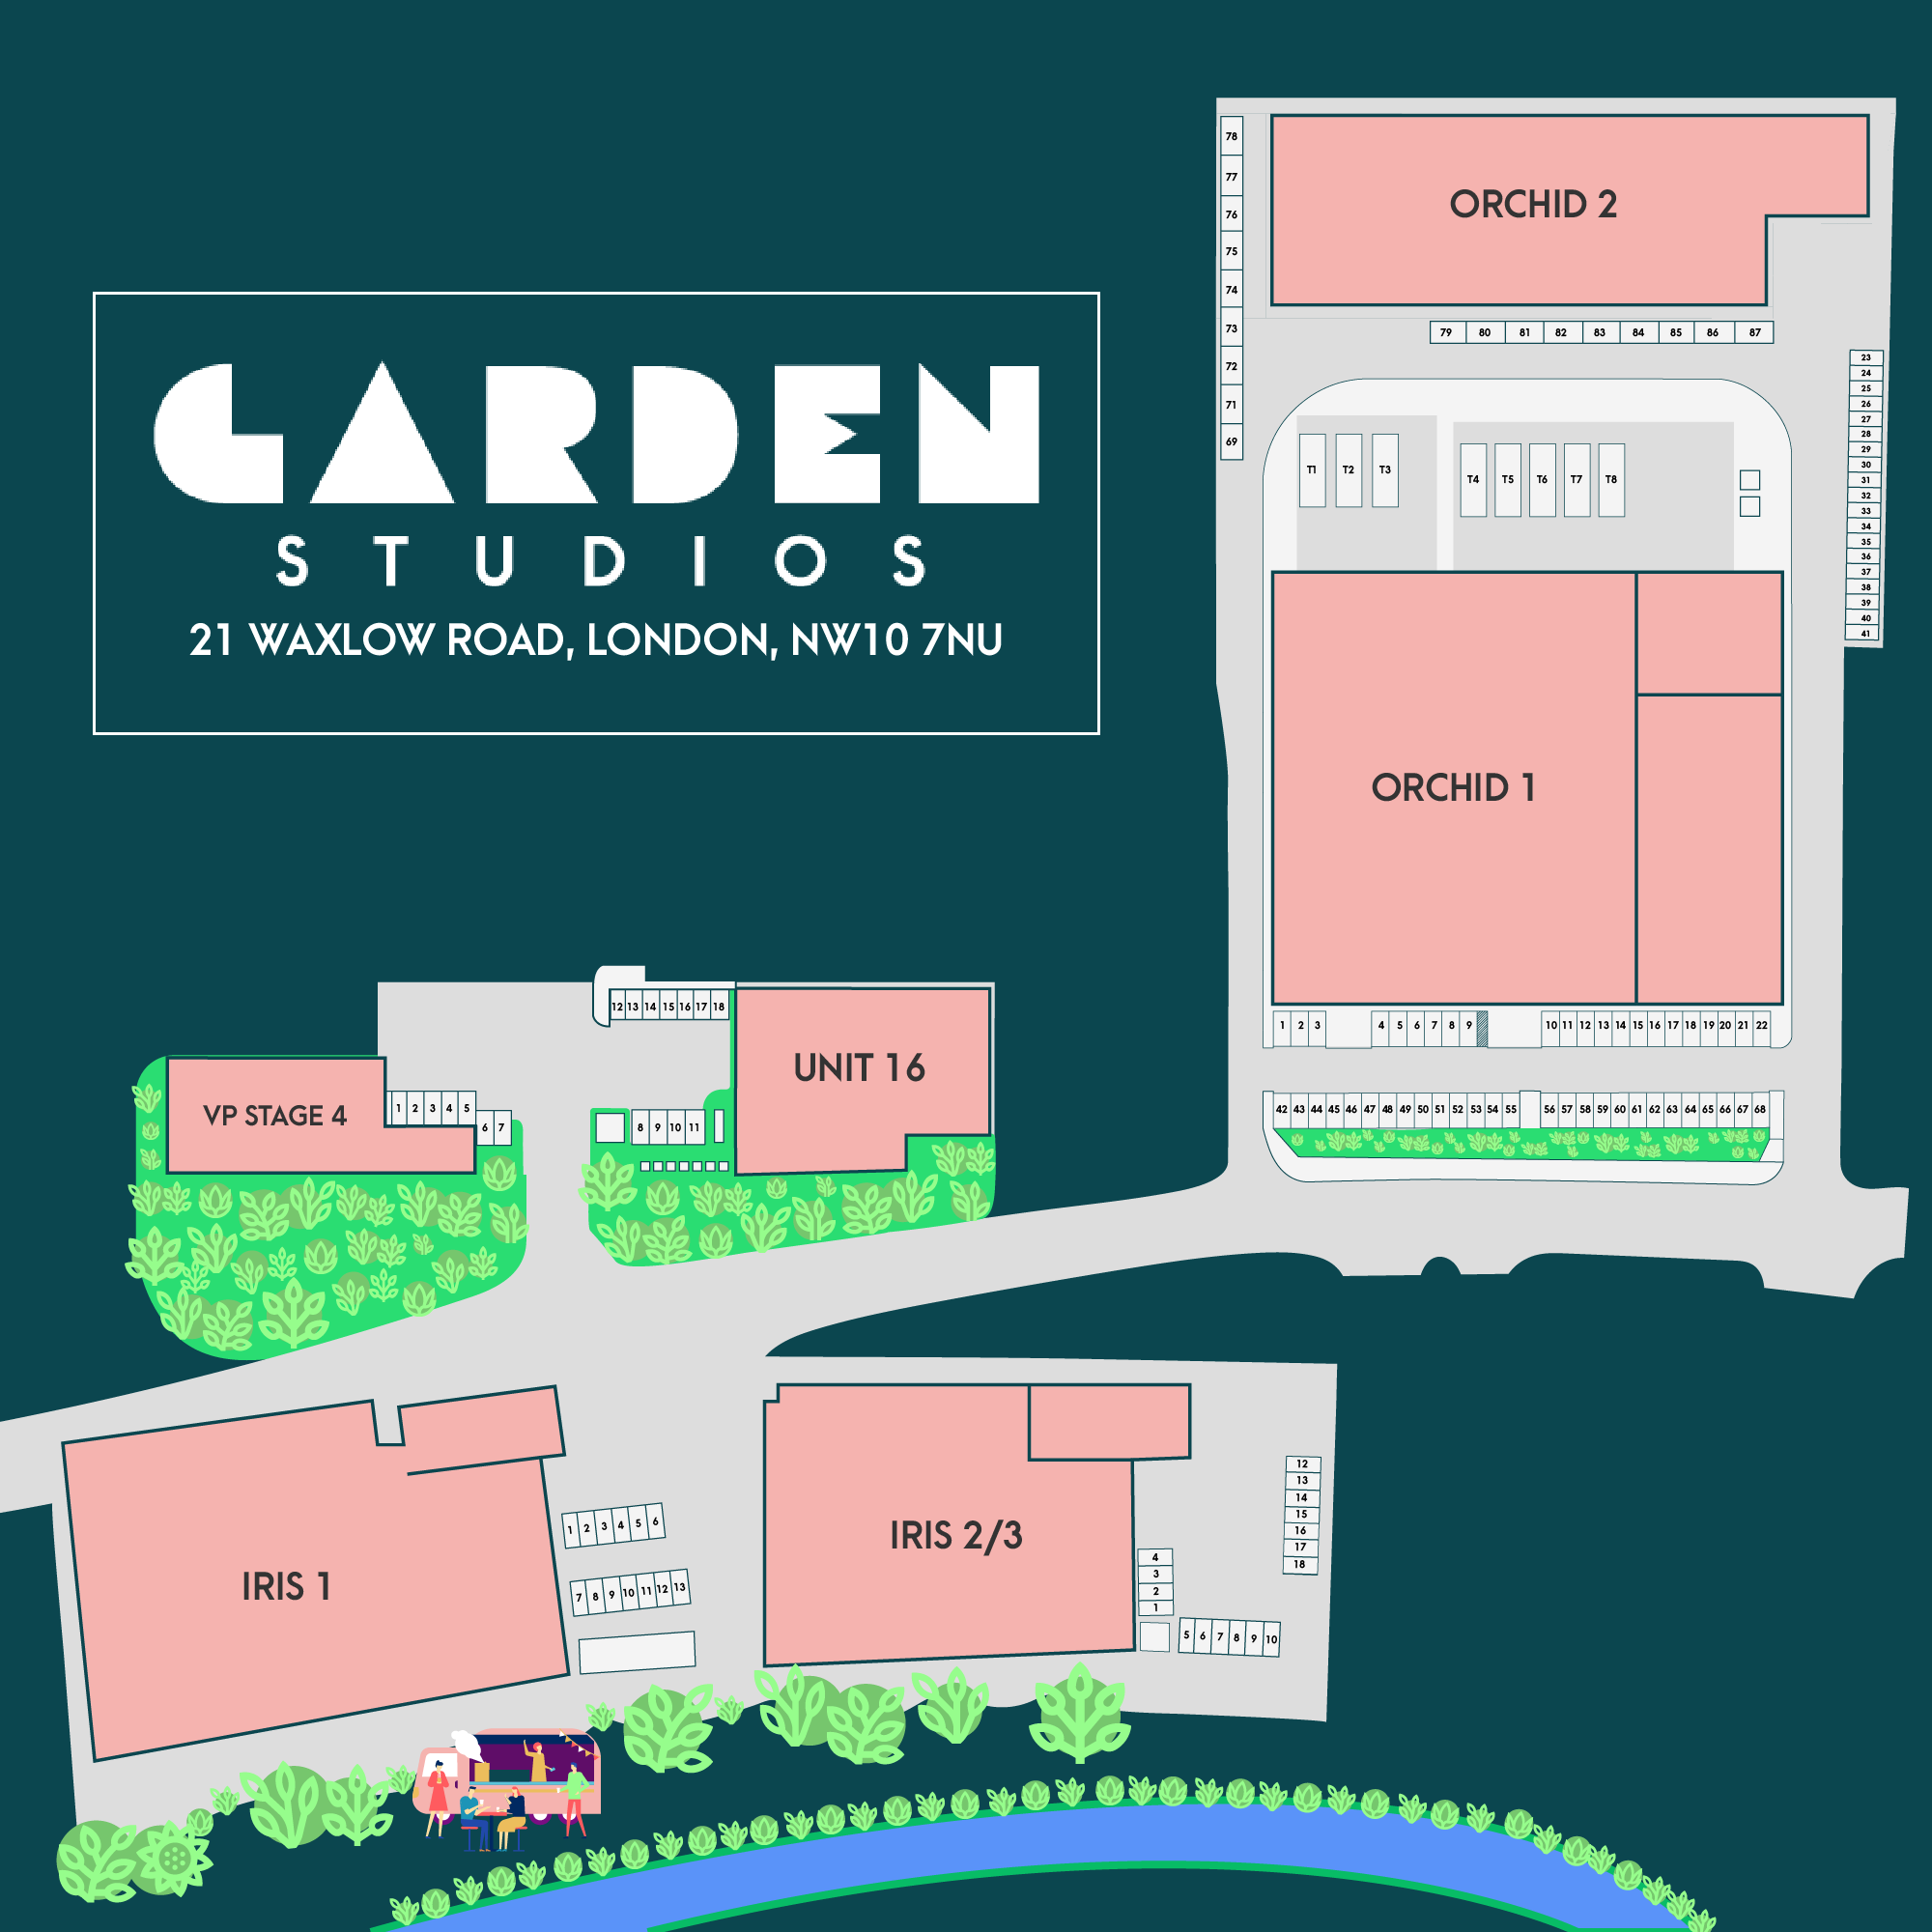 Garden Studios Campus Map